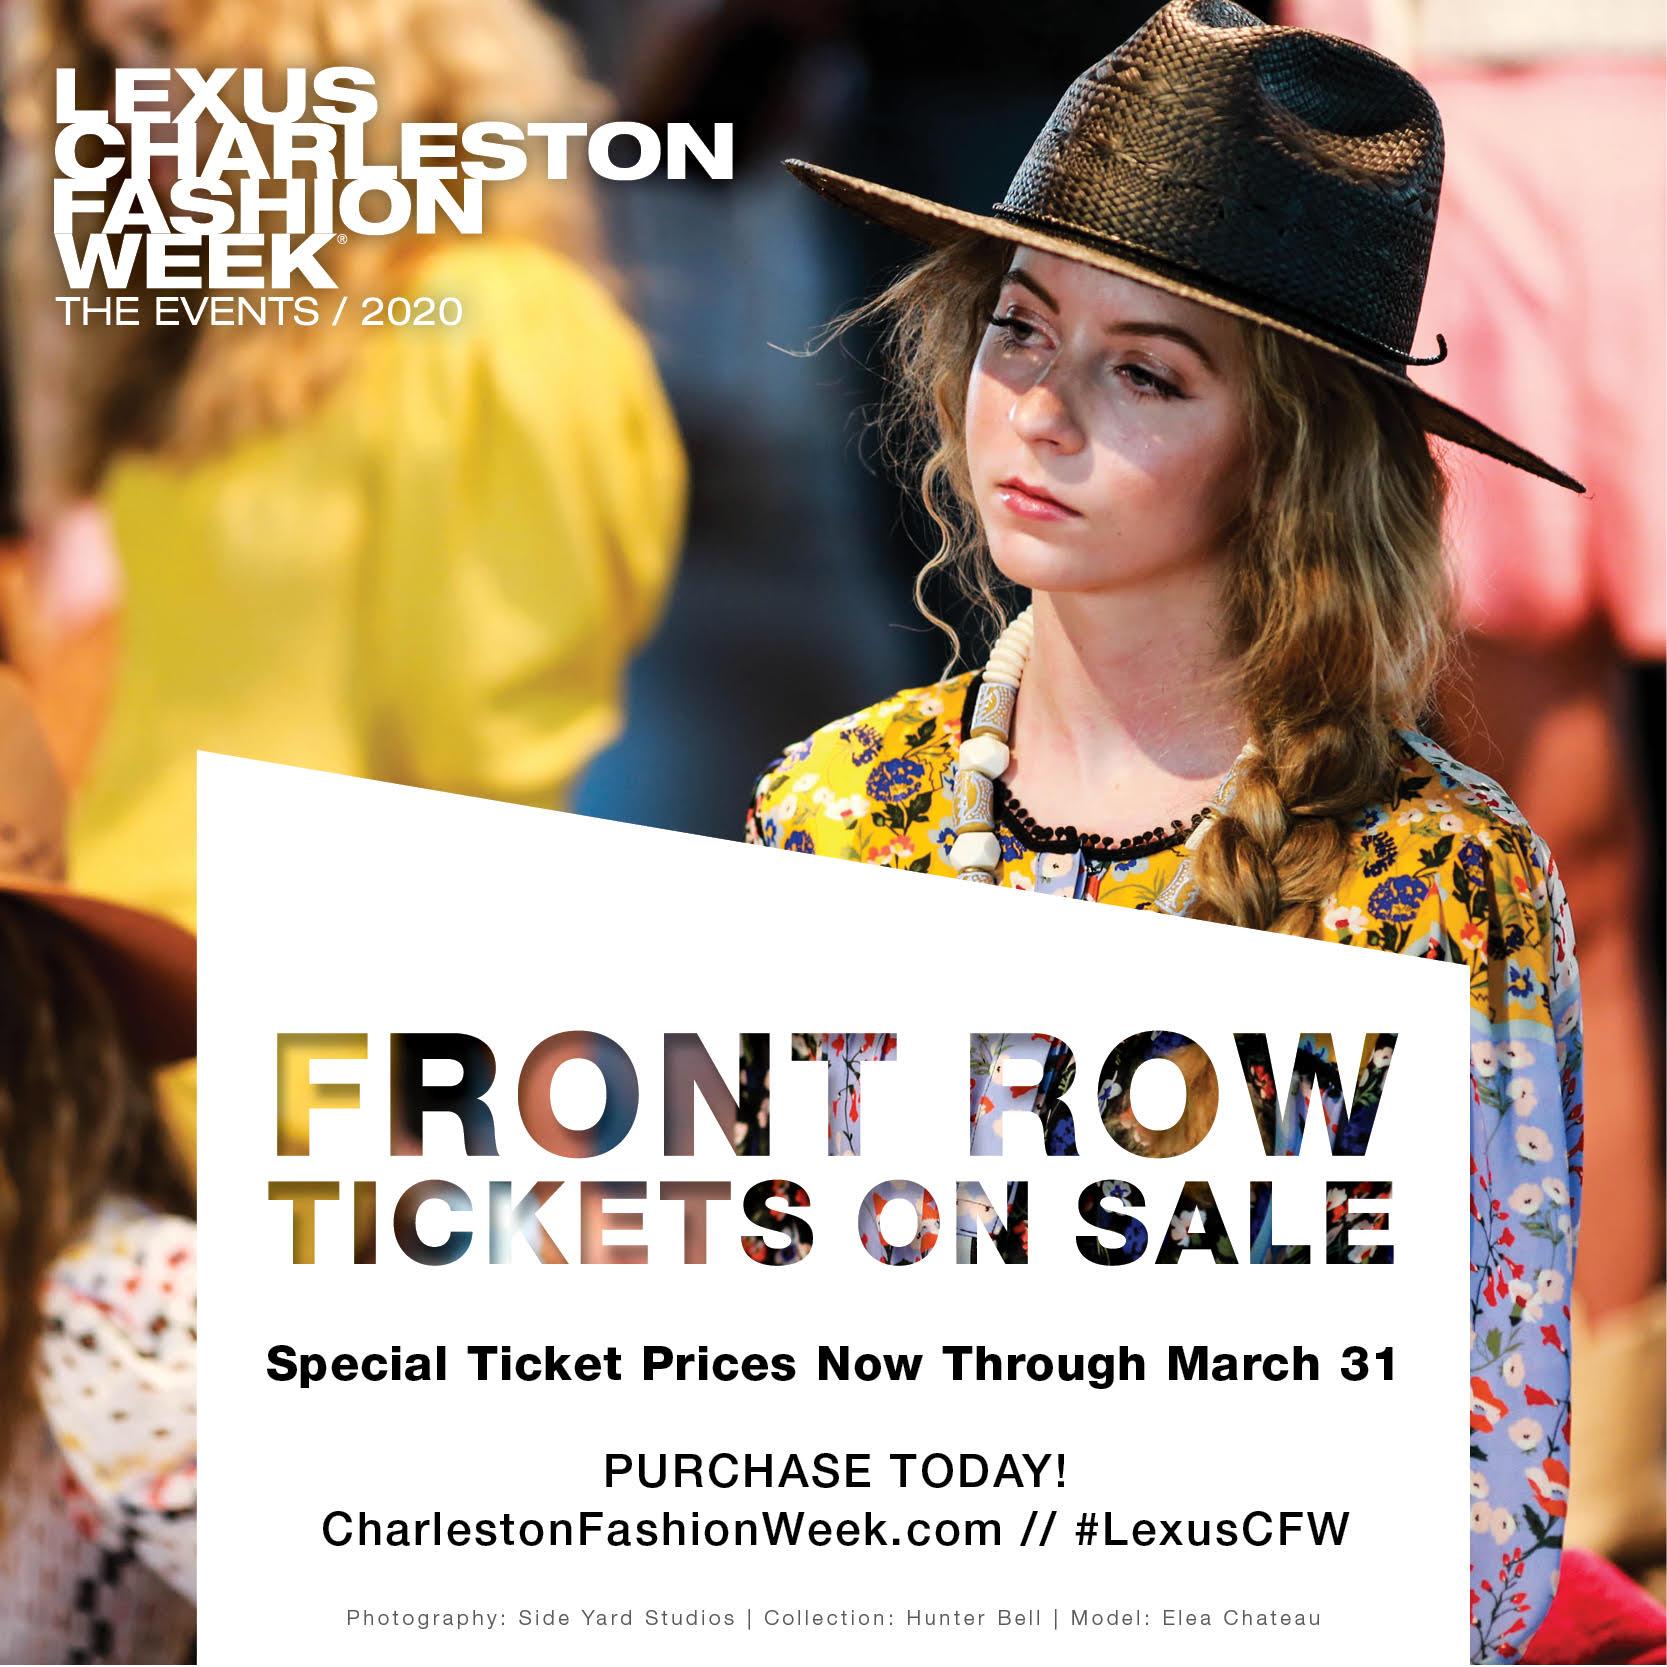 Lexus Charleston Fashion Week 2020 - The Events